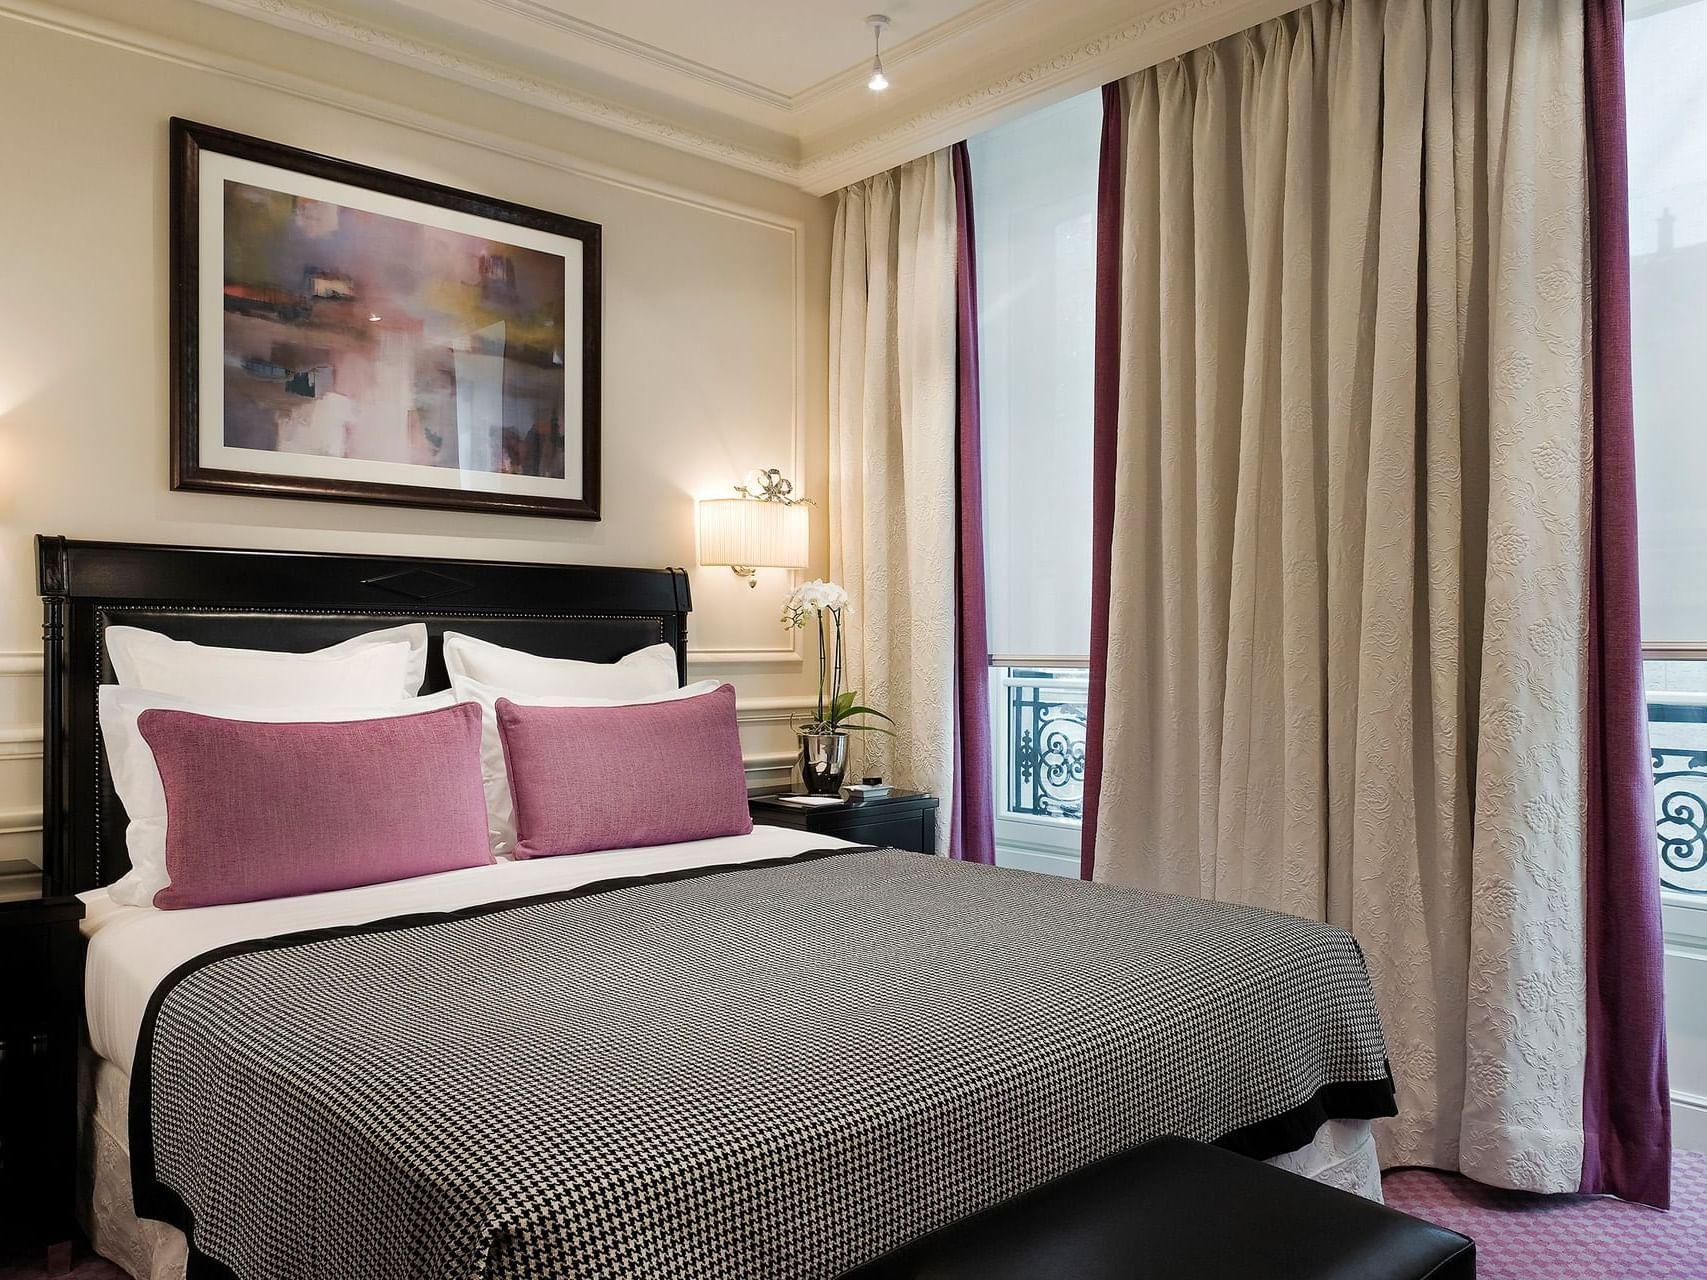 Standard room at Hotel Keppler Paris